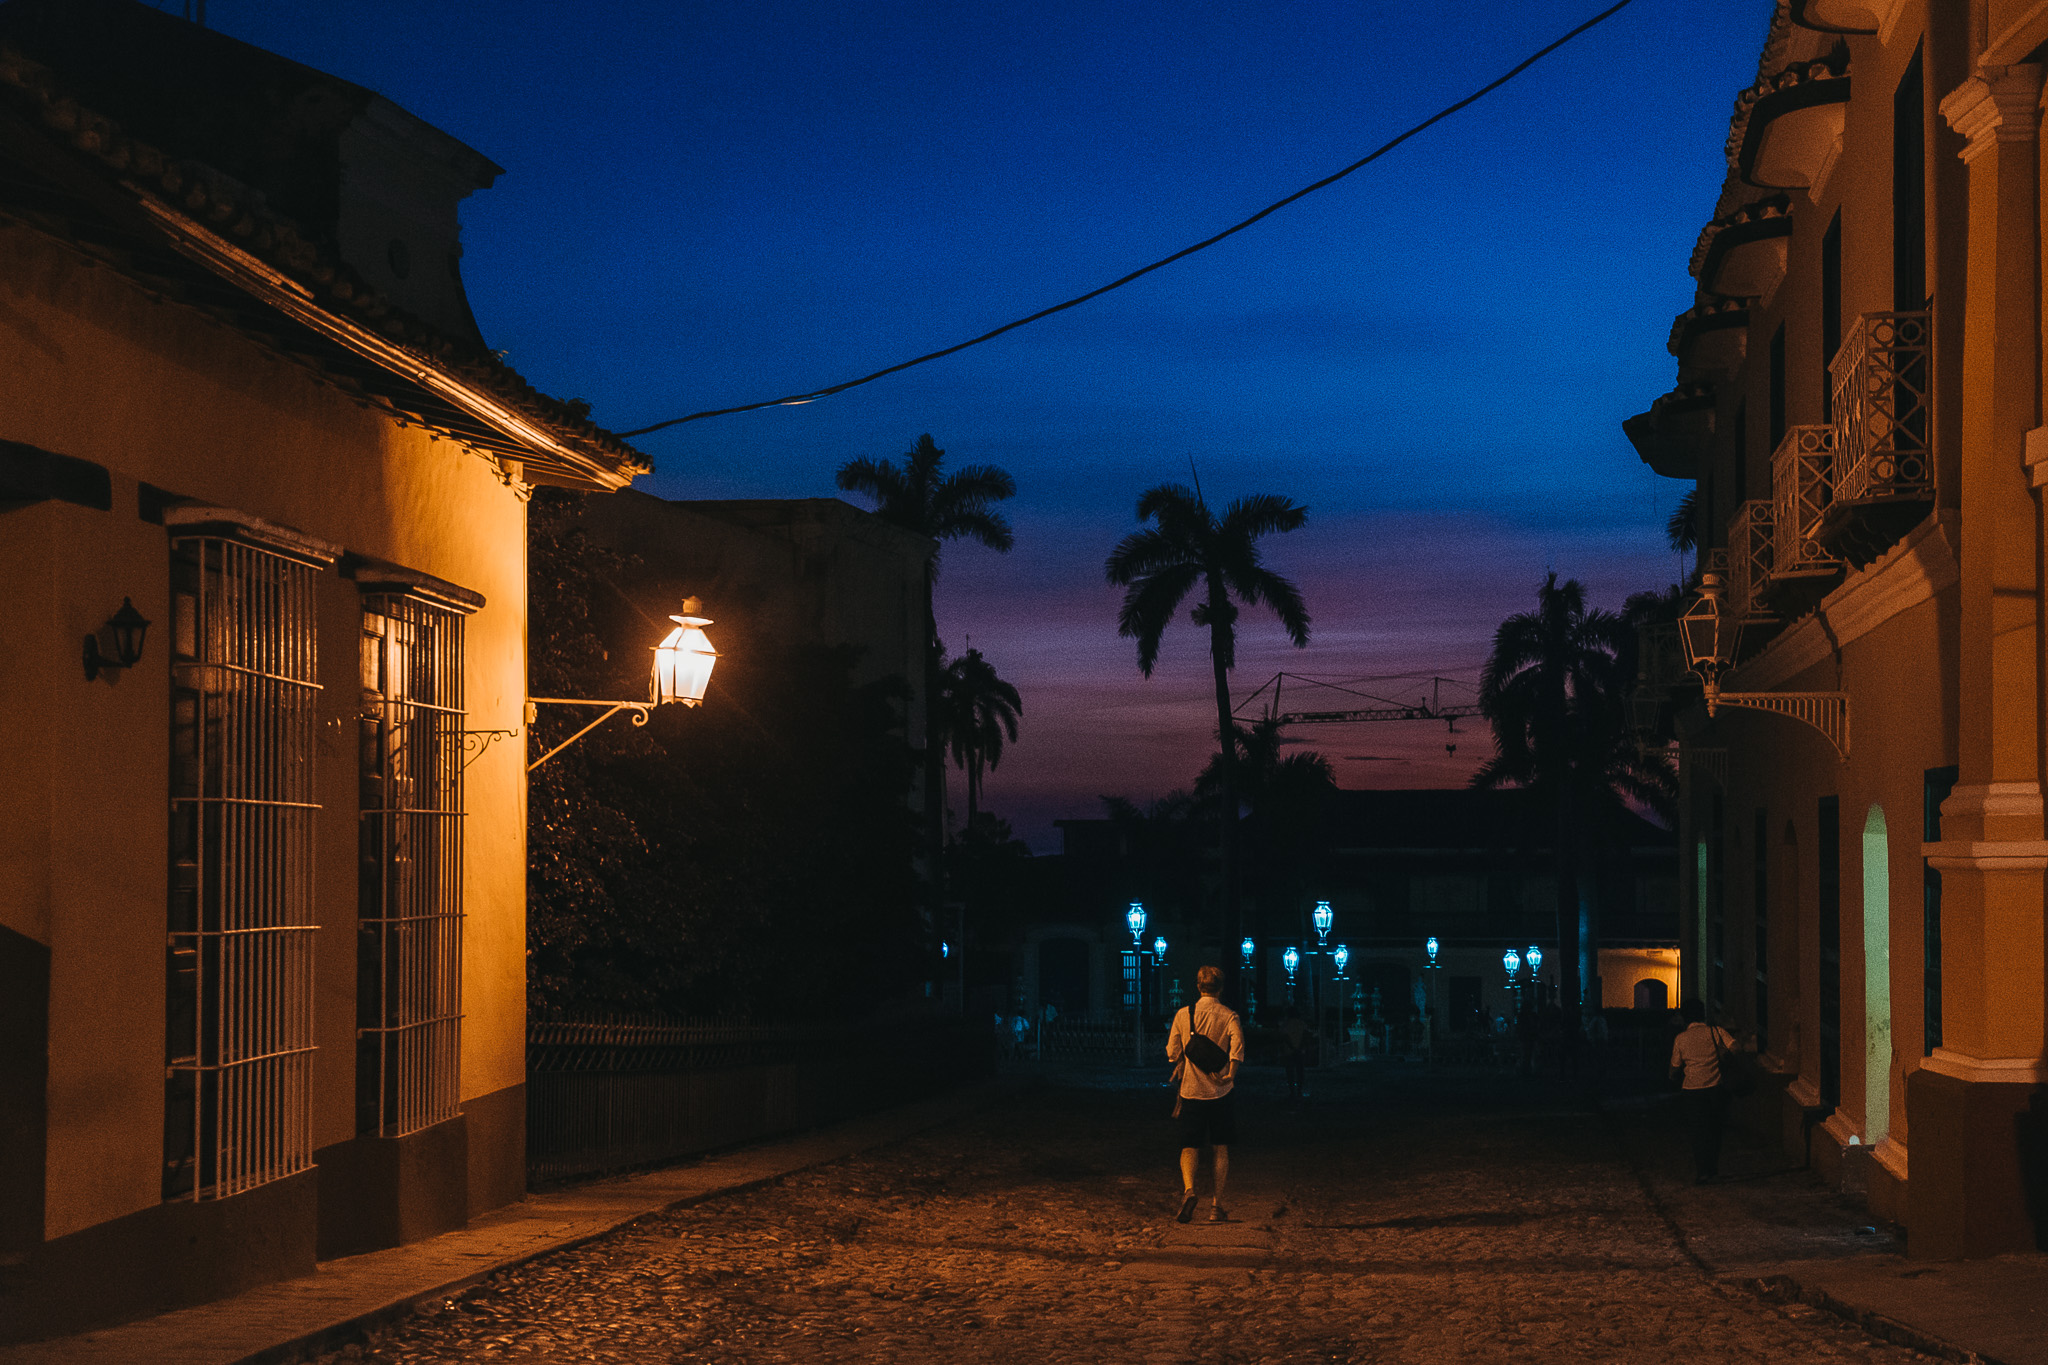 Cuba-2017-12-Trinidad-0297.jpg